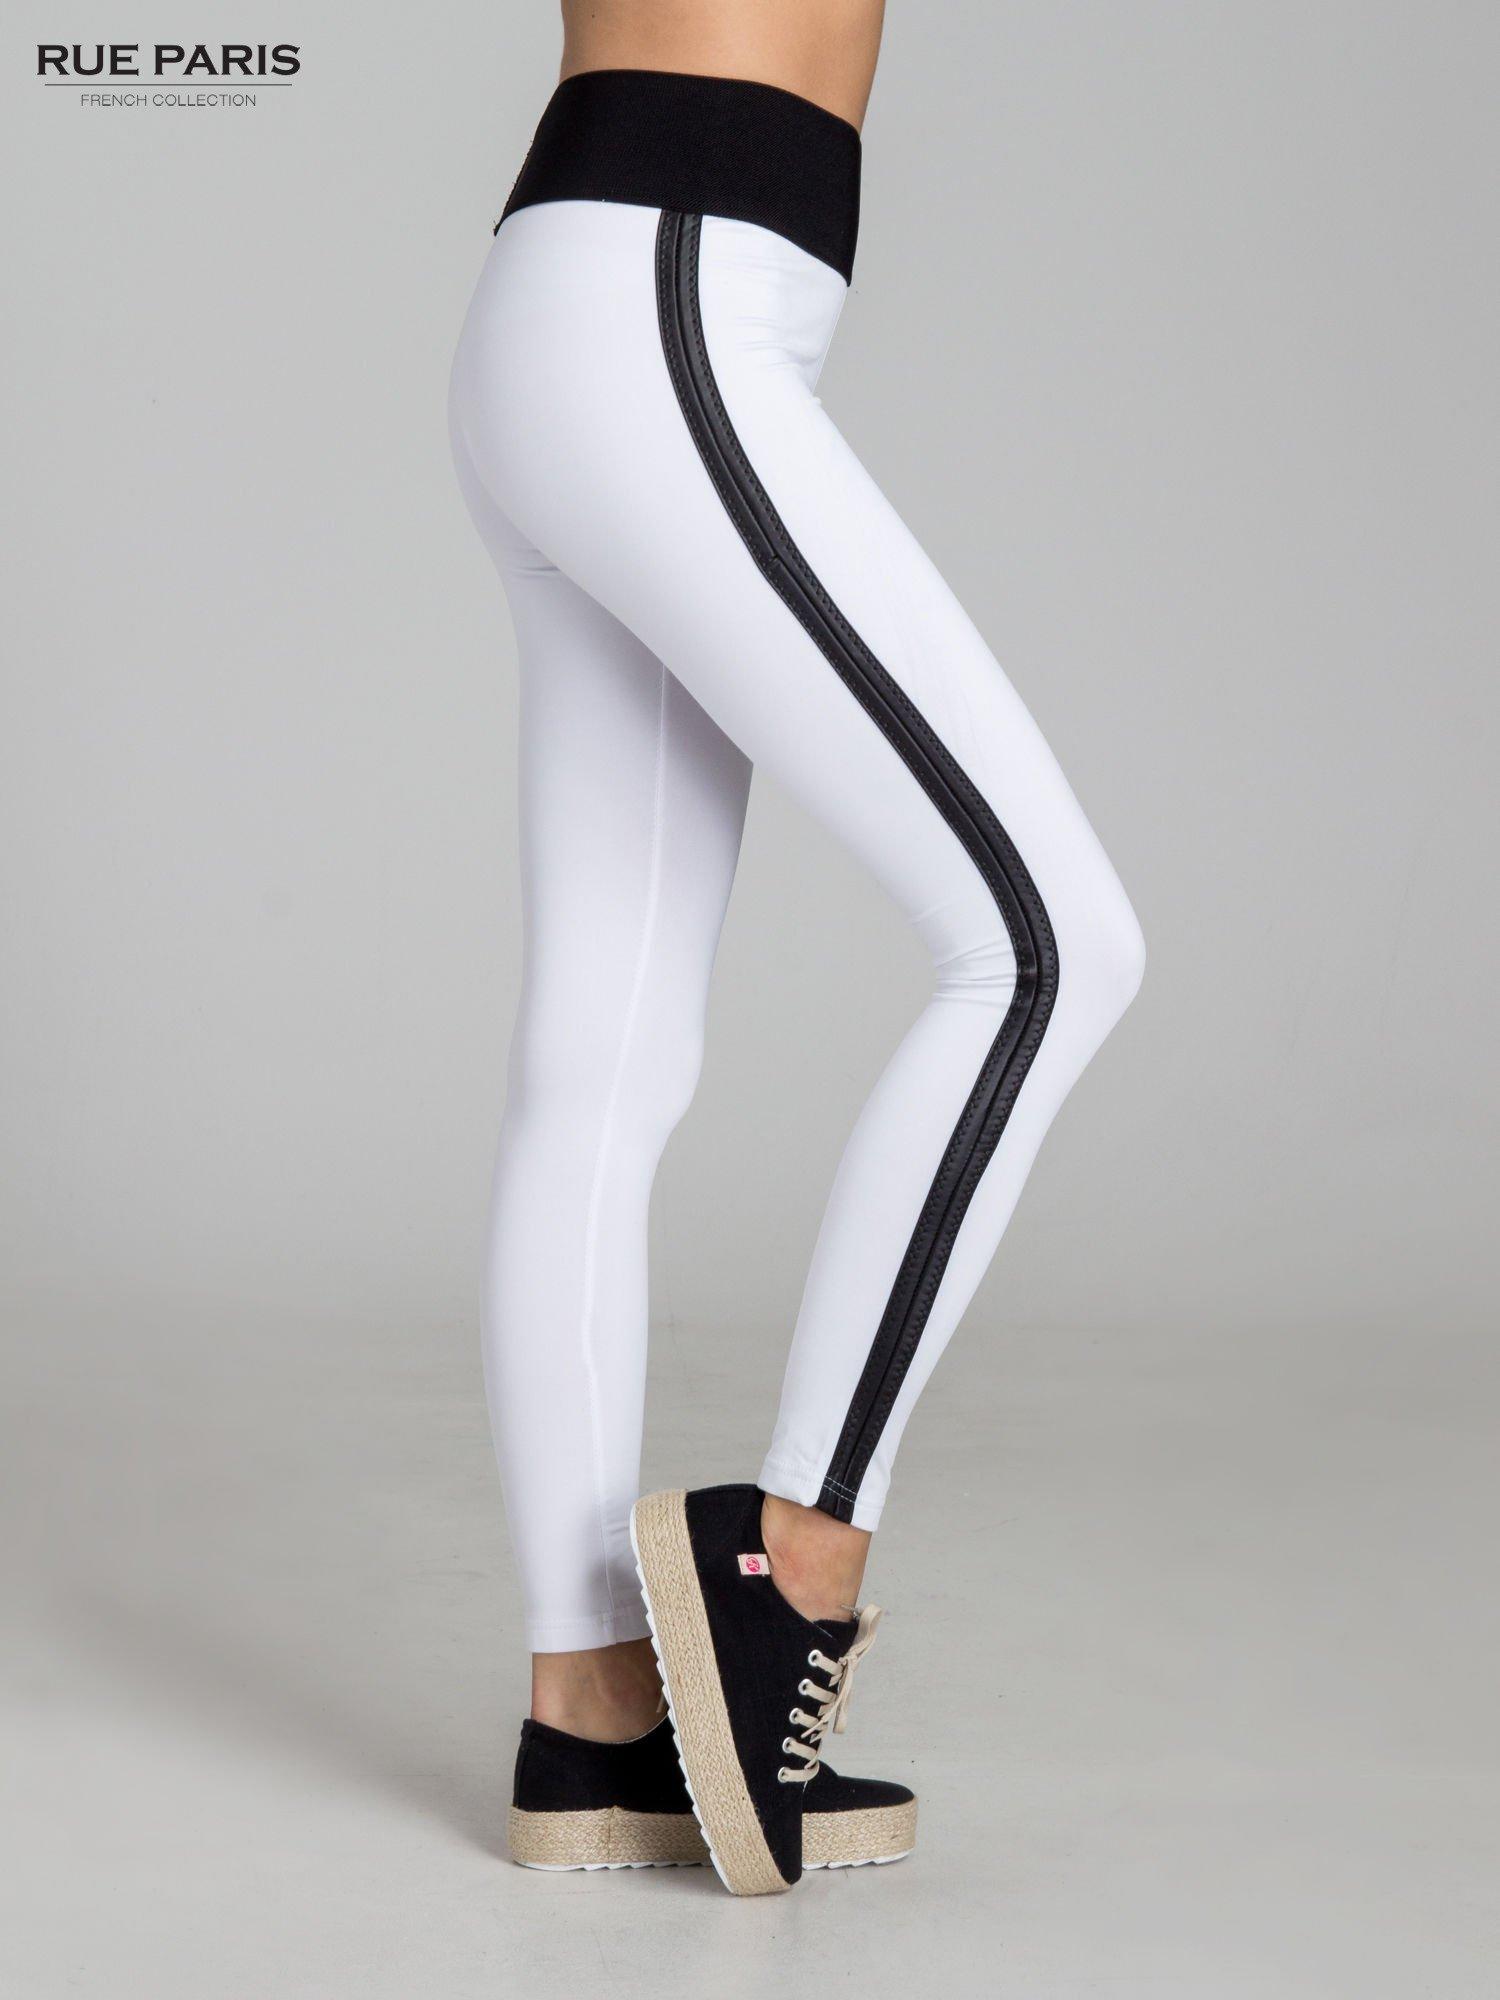 Białe legginsy ze skórzanymi lampasami po bokach                                  zdj.                                  3